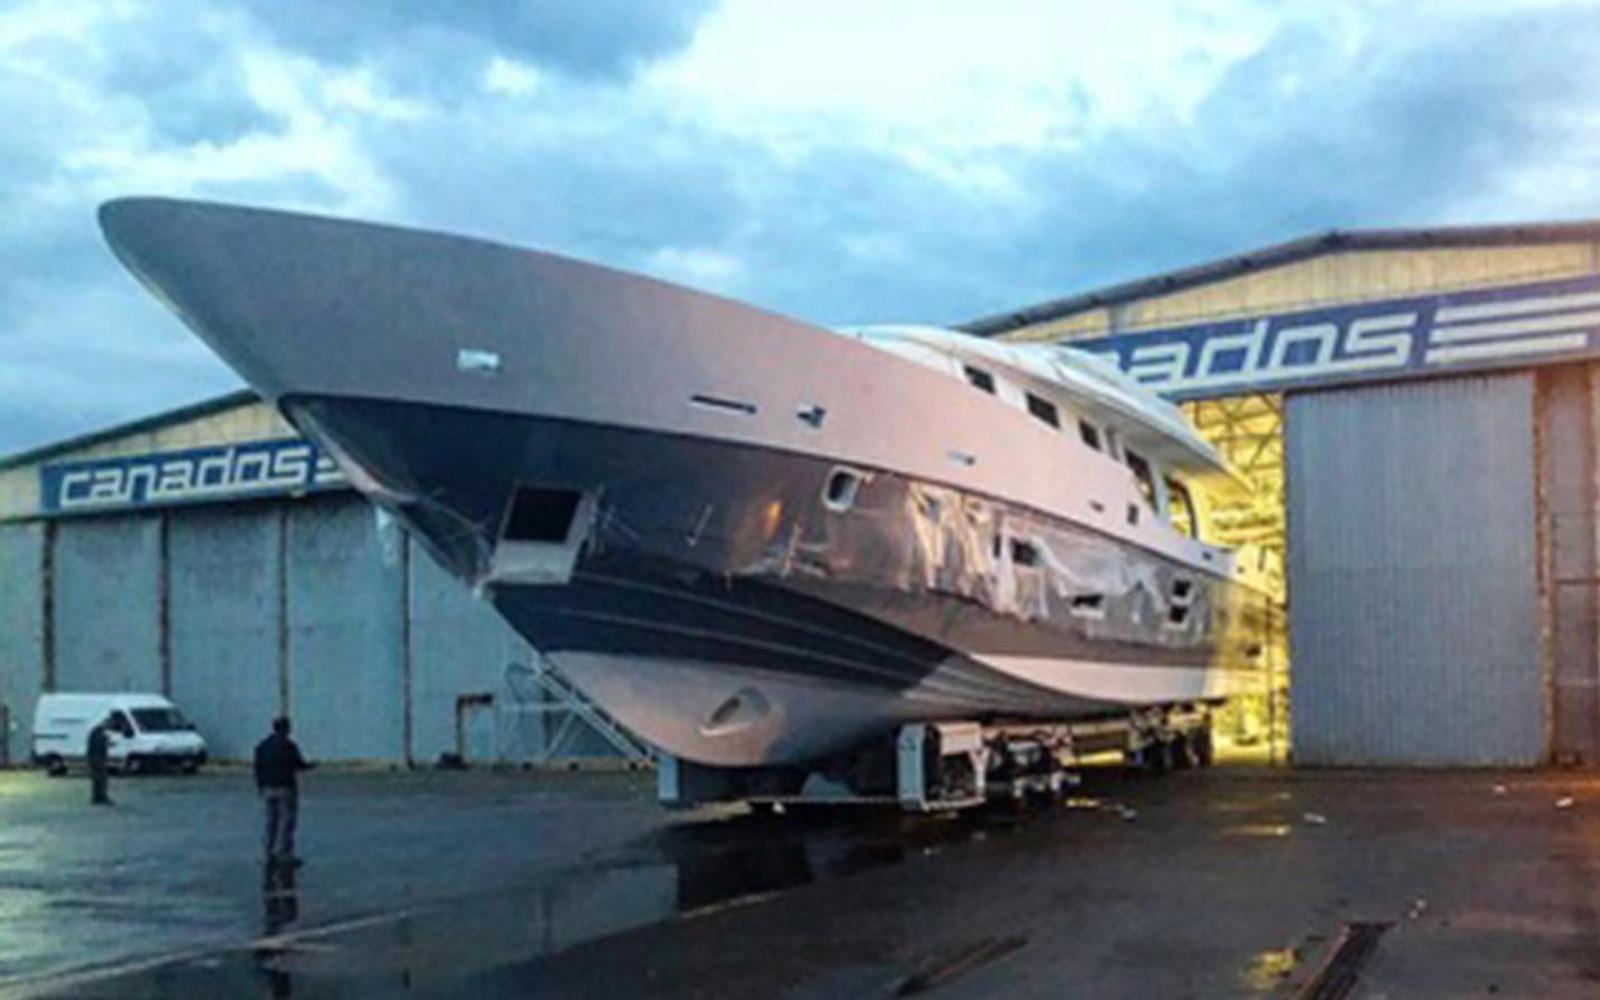 Terceiro iate Canados 120 tem casco e superestrutura unidos-boatshopping